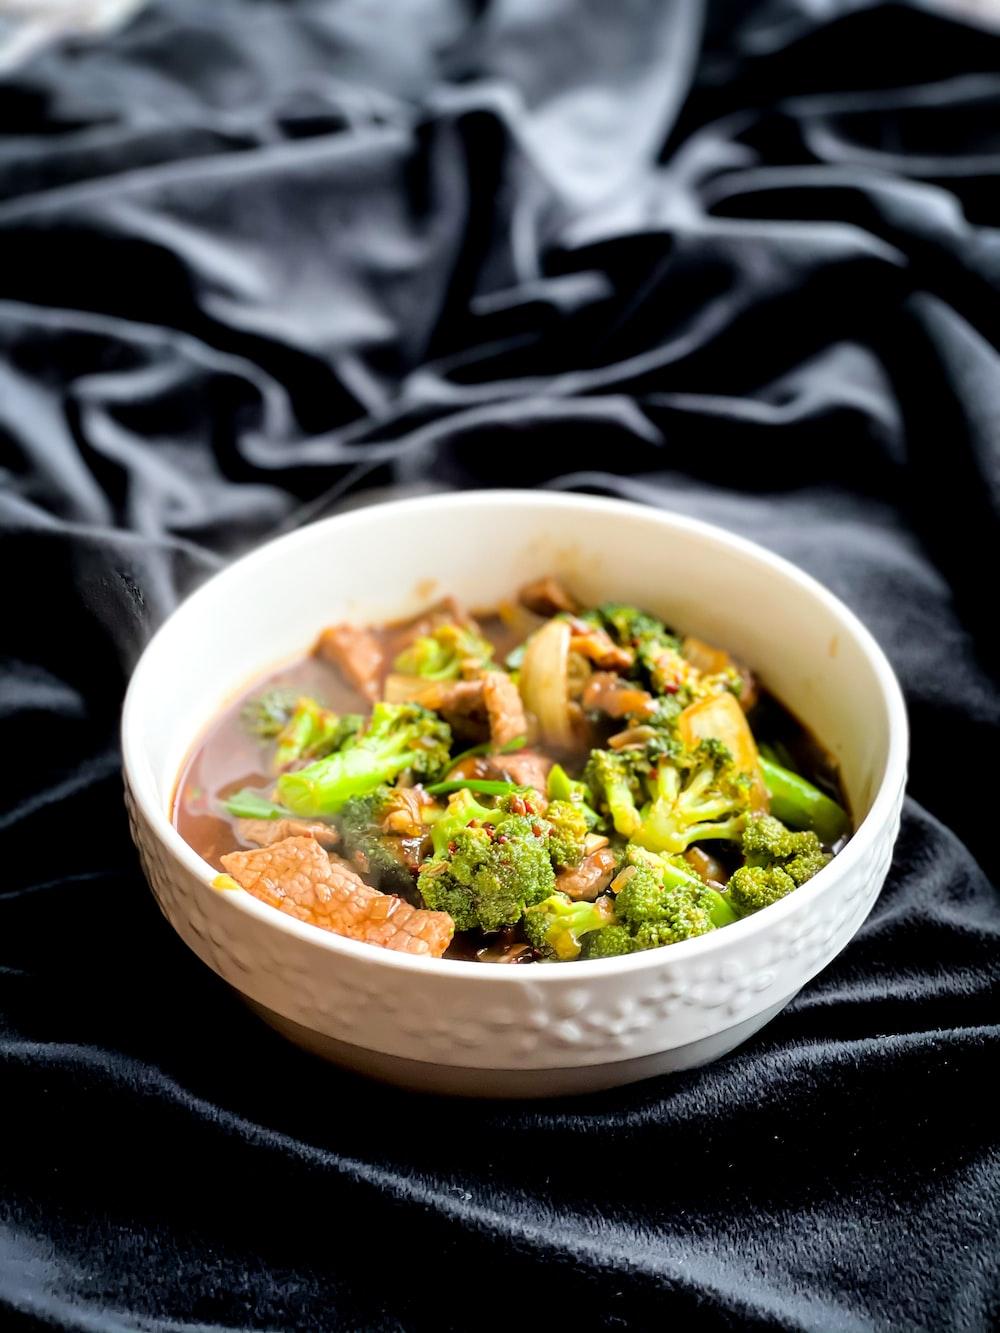 green vegetable in white ceramic bowl